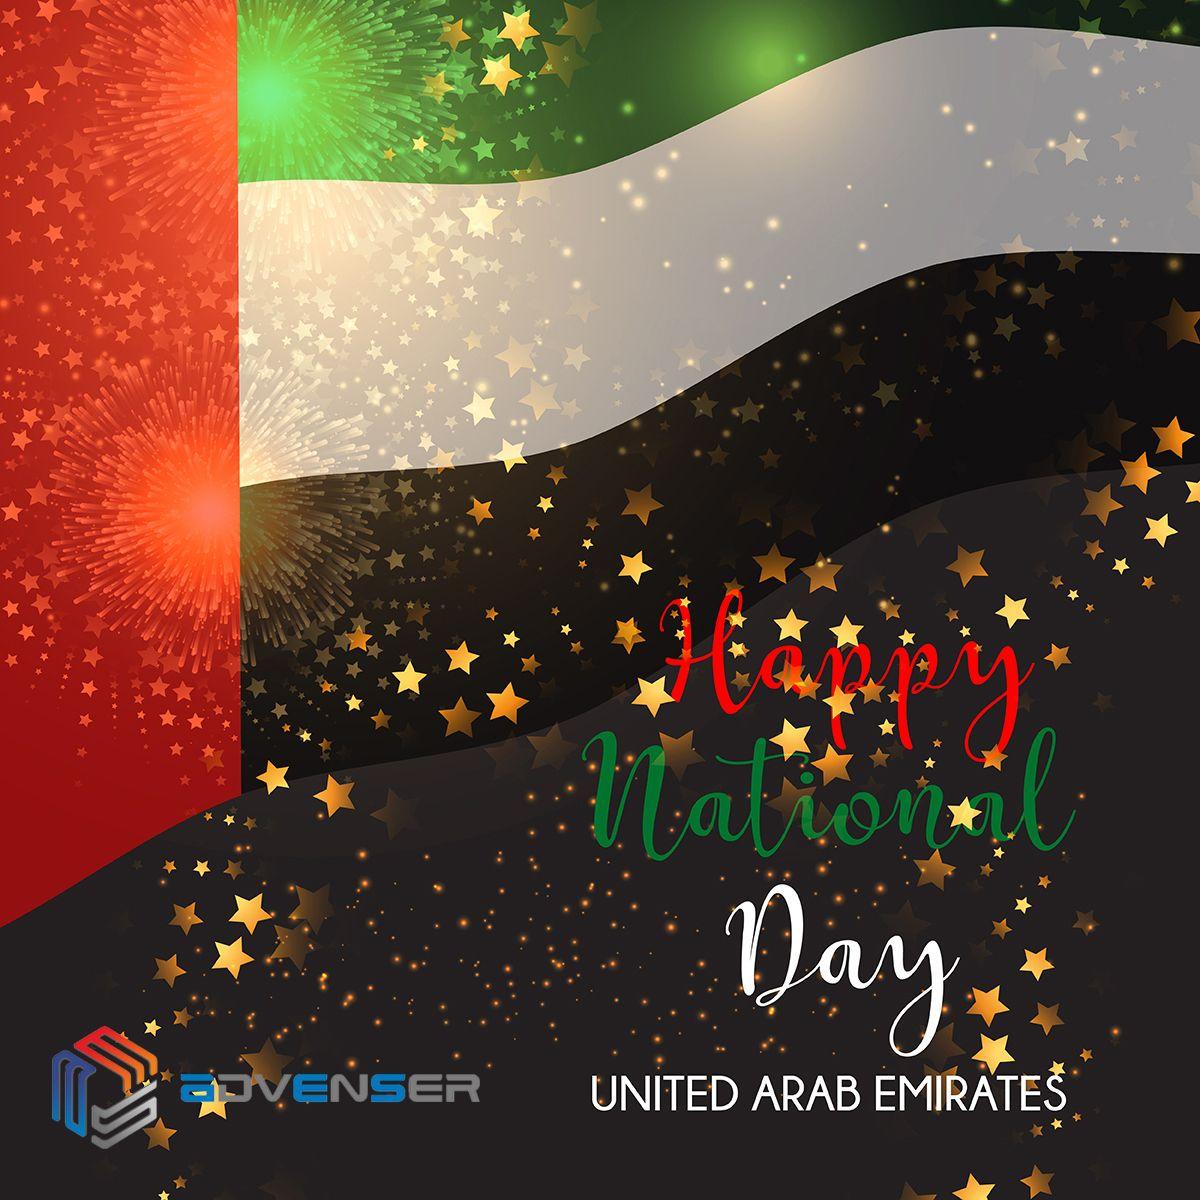 Happy UAE National Day! #UAENationalDay #UAENationalday48  #NationalDay #UAE #December2 #UAEFlag